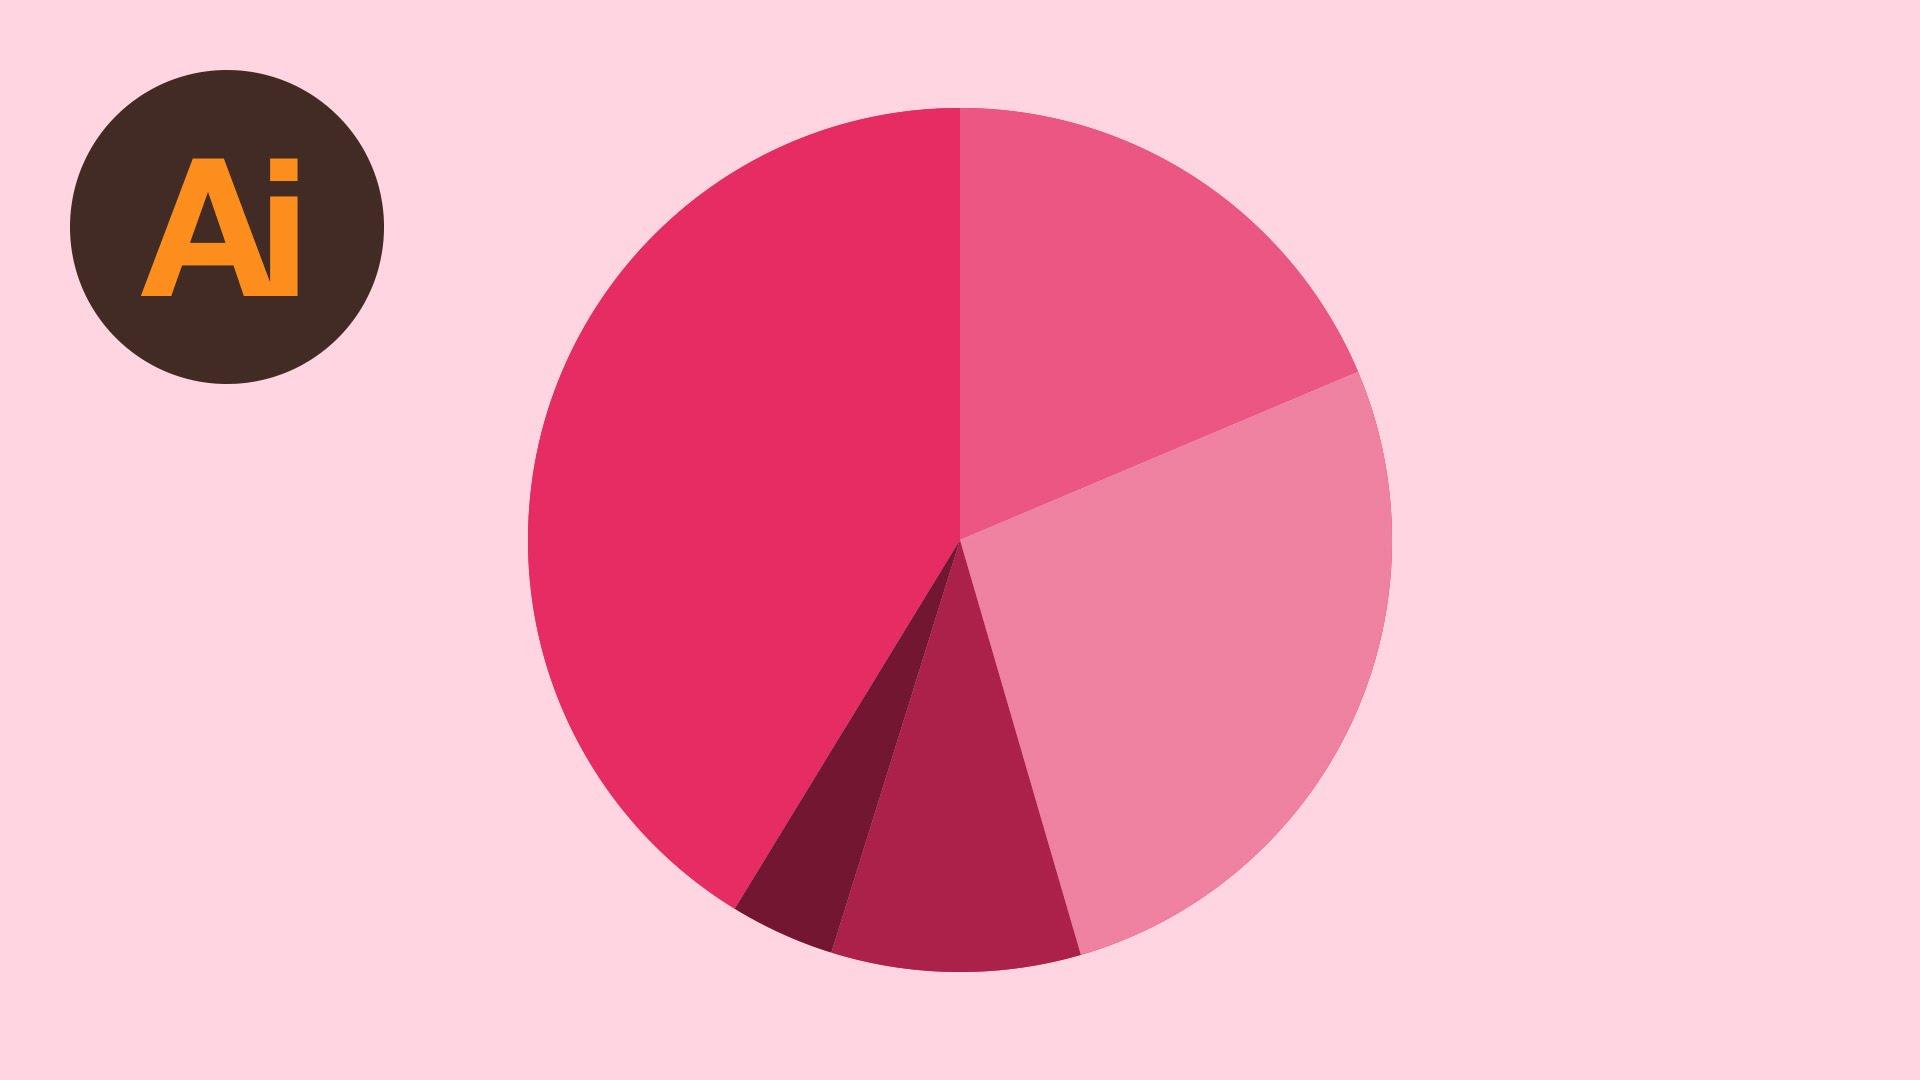 Pie graph illustration photo